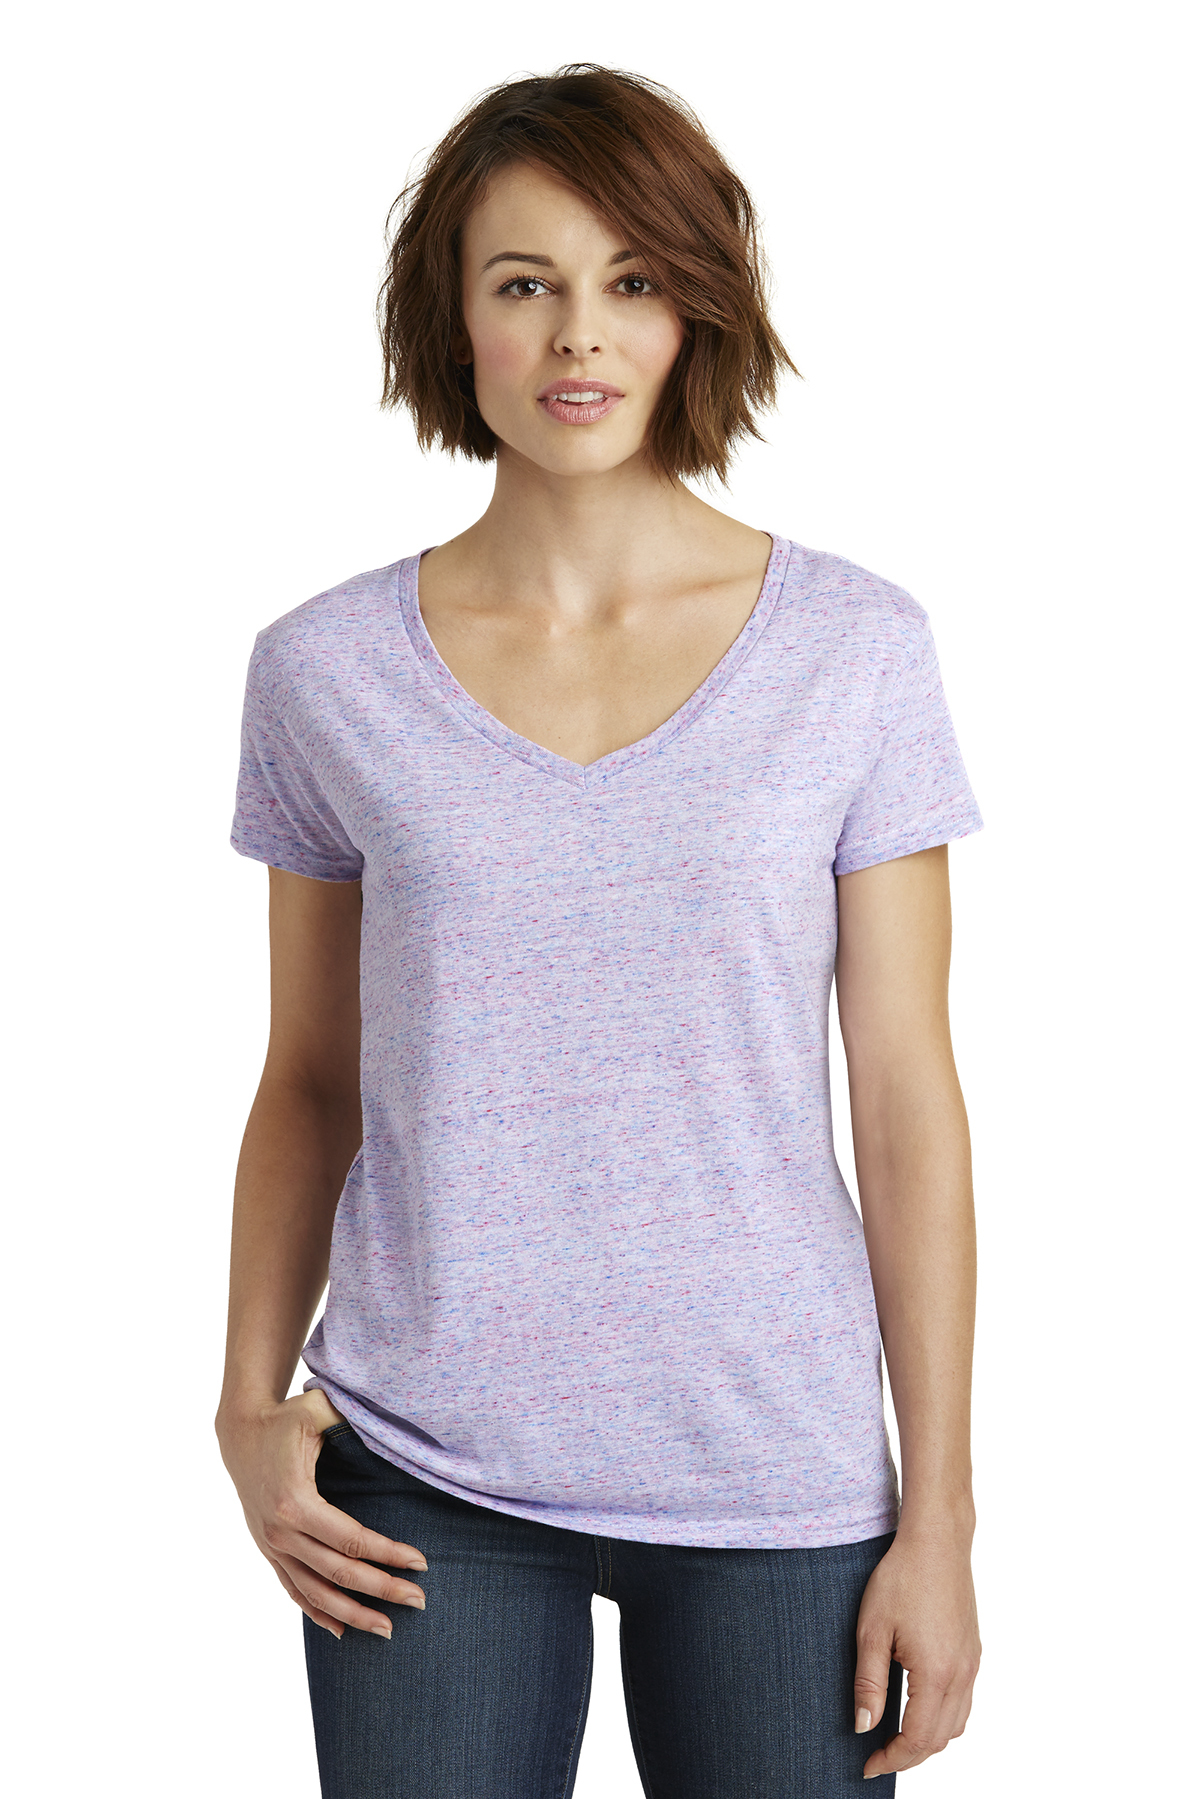 a7c7fa0d1 District ® Women's Cosmic V-Neck Tee | Ladies/Women | T-Shirts ...